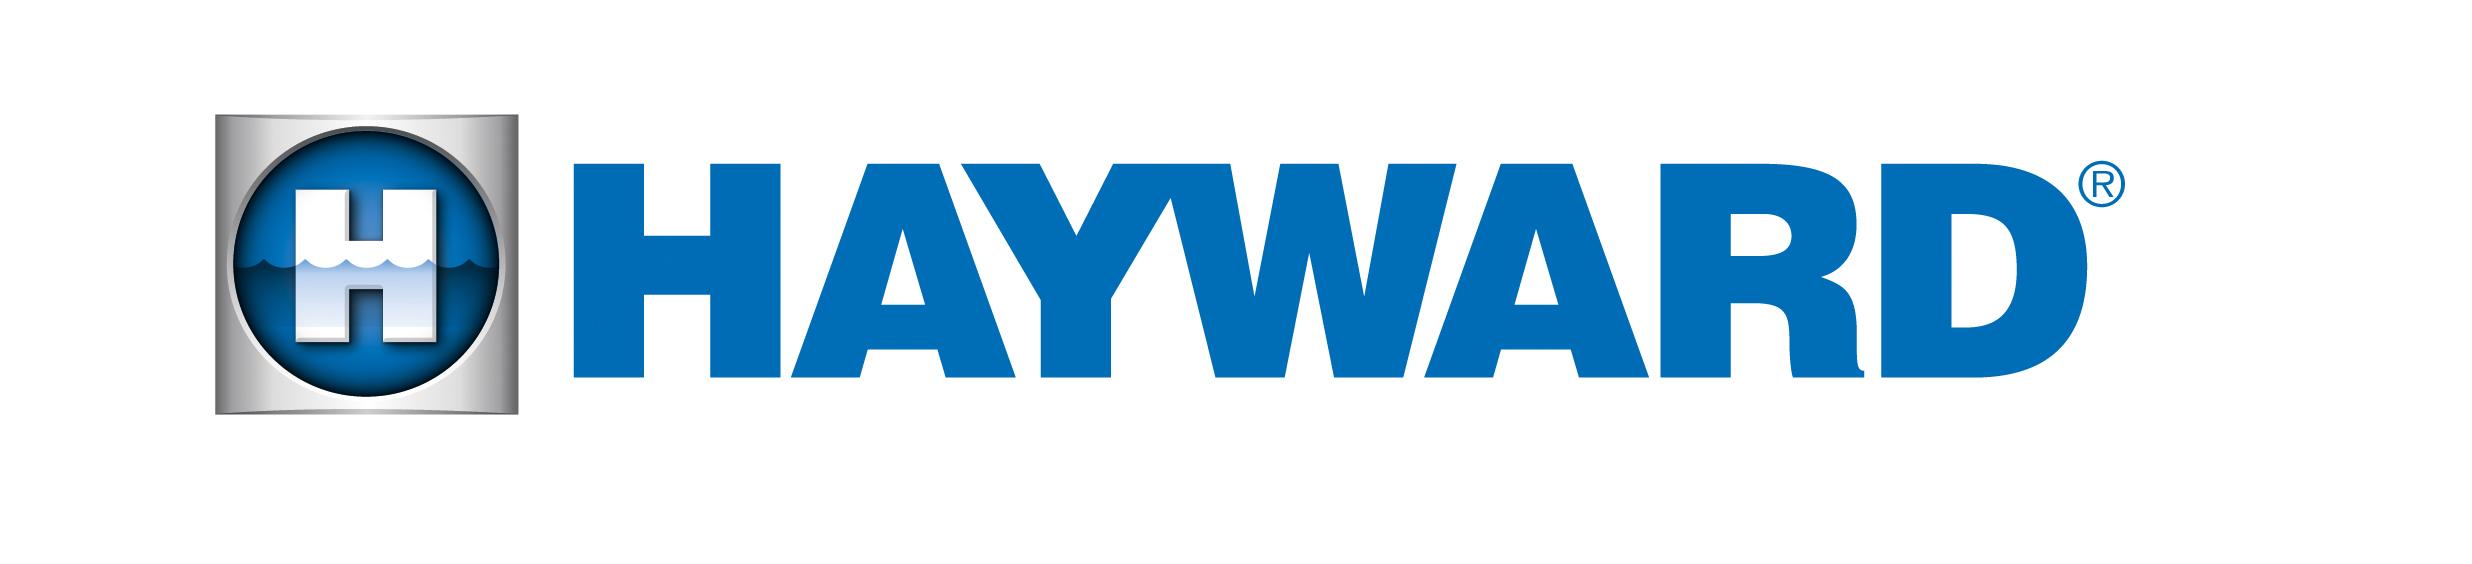 Hayward09FLogo2C_RGB.jpg